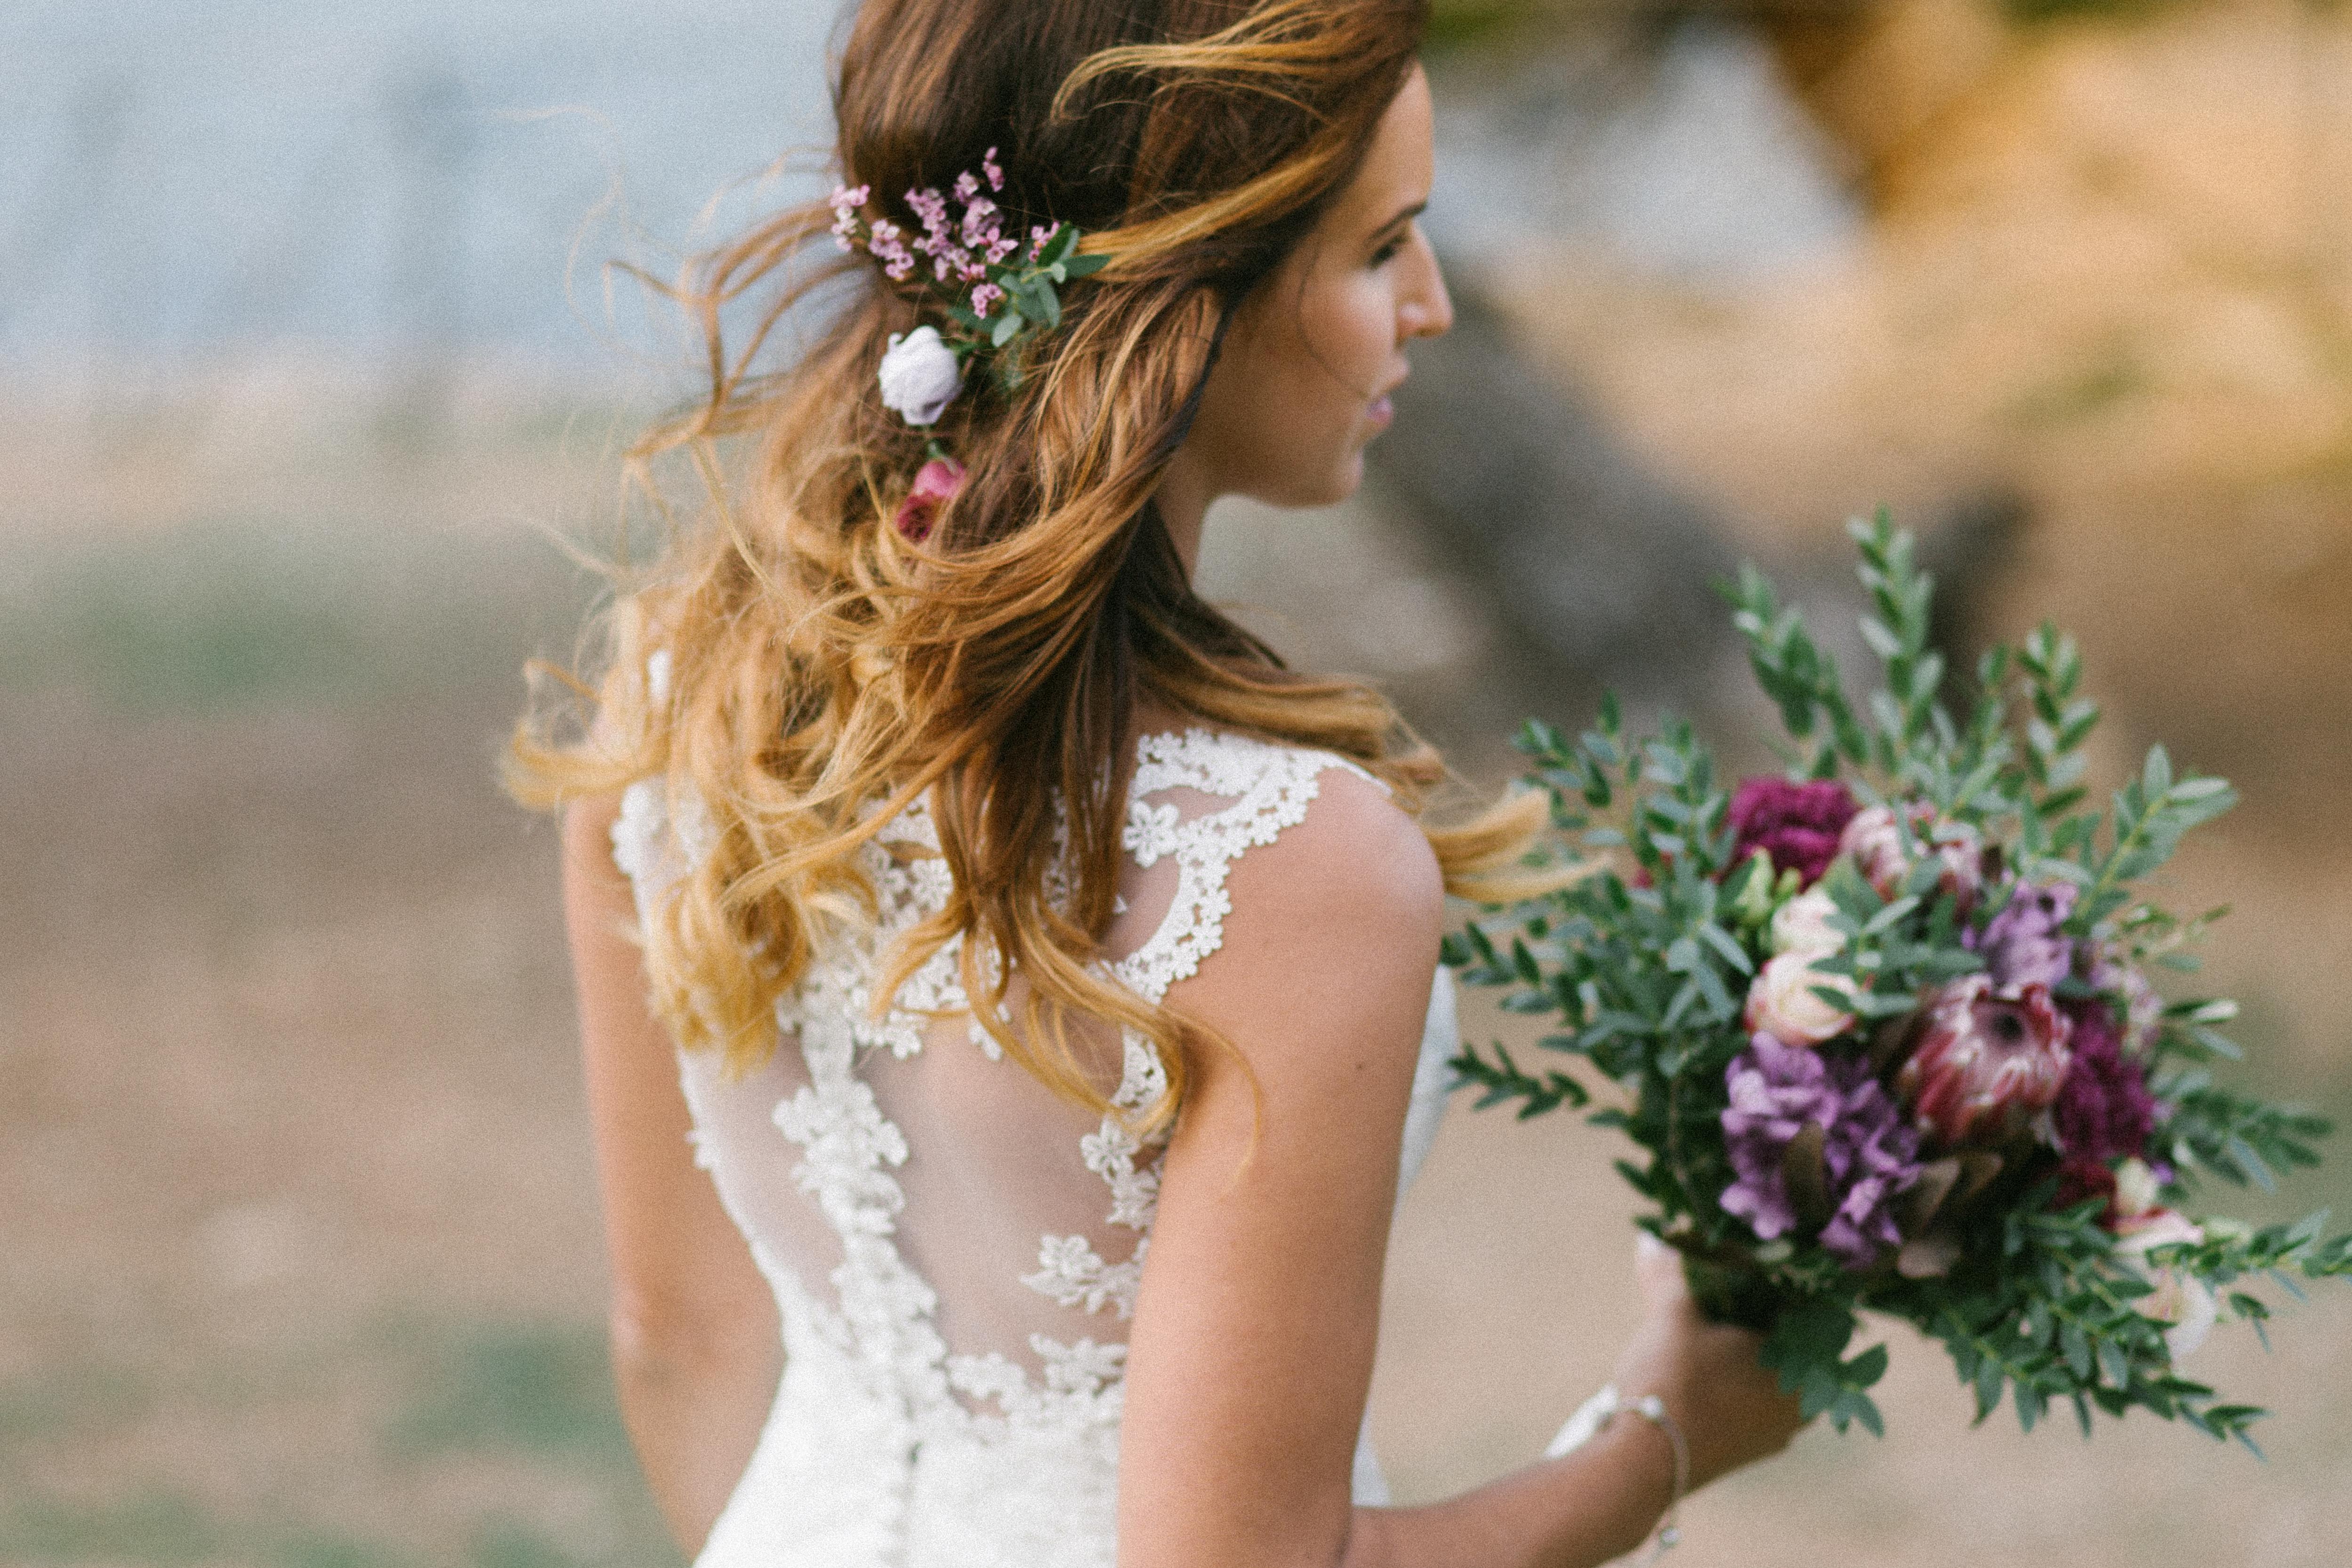 boho-mallorca-boho-ibiza-ibiza-wedding-mallorca-wedding-hochzeit-mallorca-ibiza-photographer-mallorca-photographer-wedding-destination-crazy-wedding-future-wedding-modern-wedding39